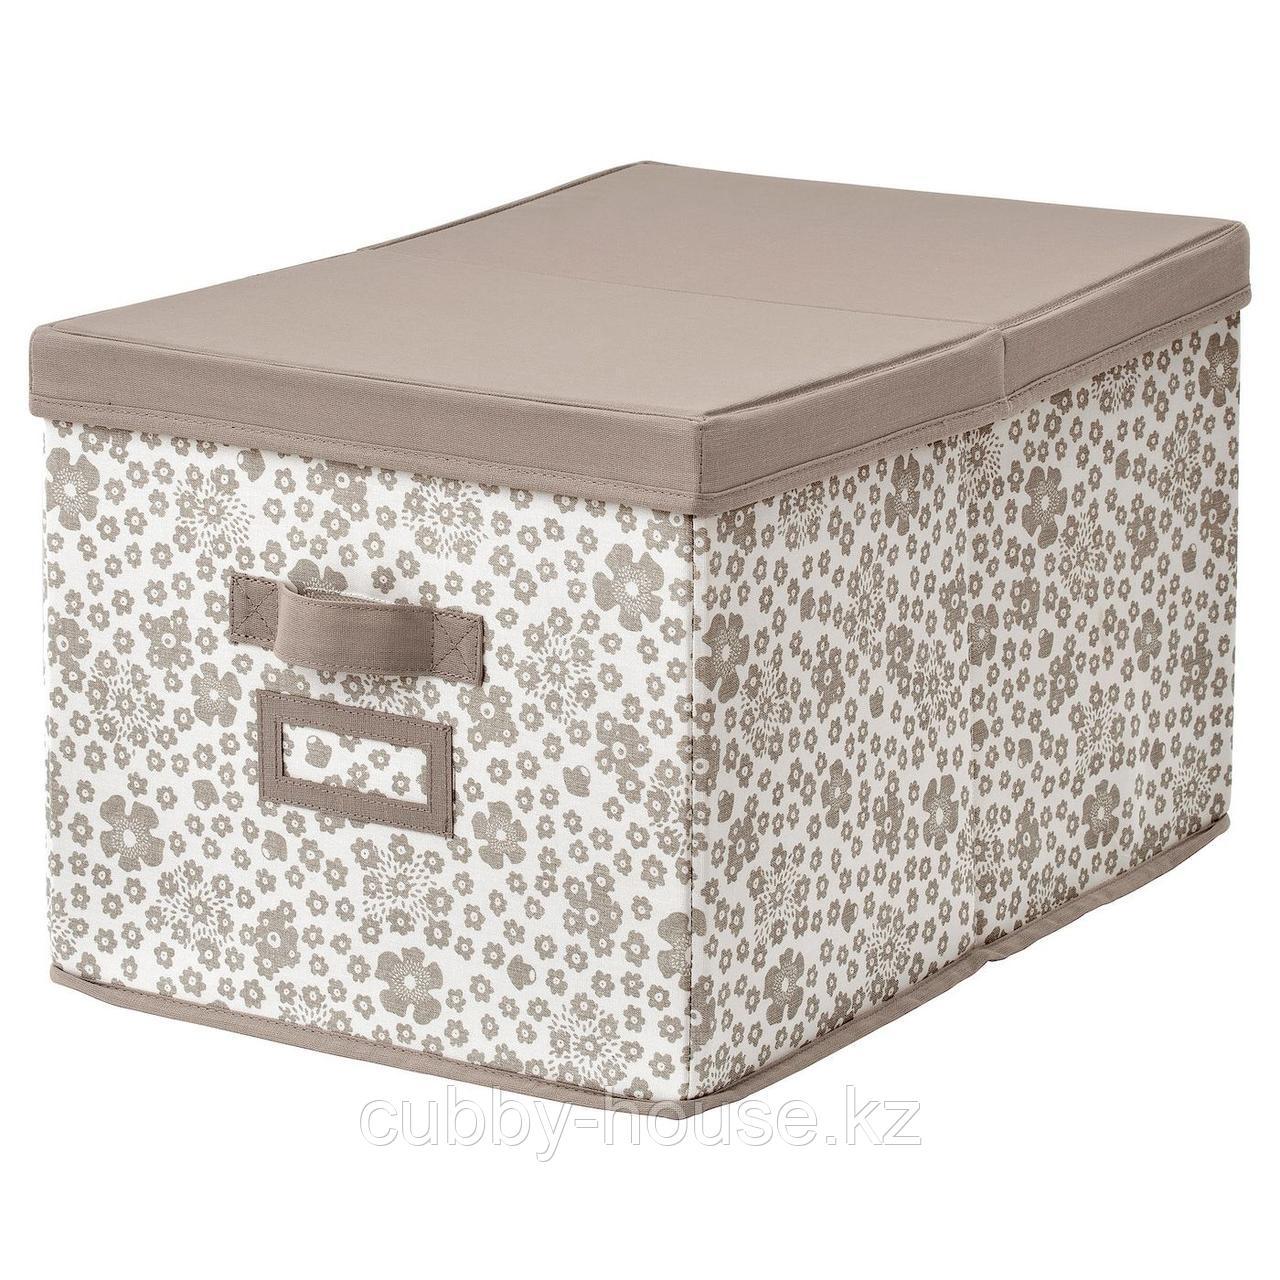 СТОРСТАББЕ Коробка с крышкой, бежевый, 35x50x30 см